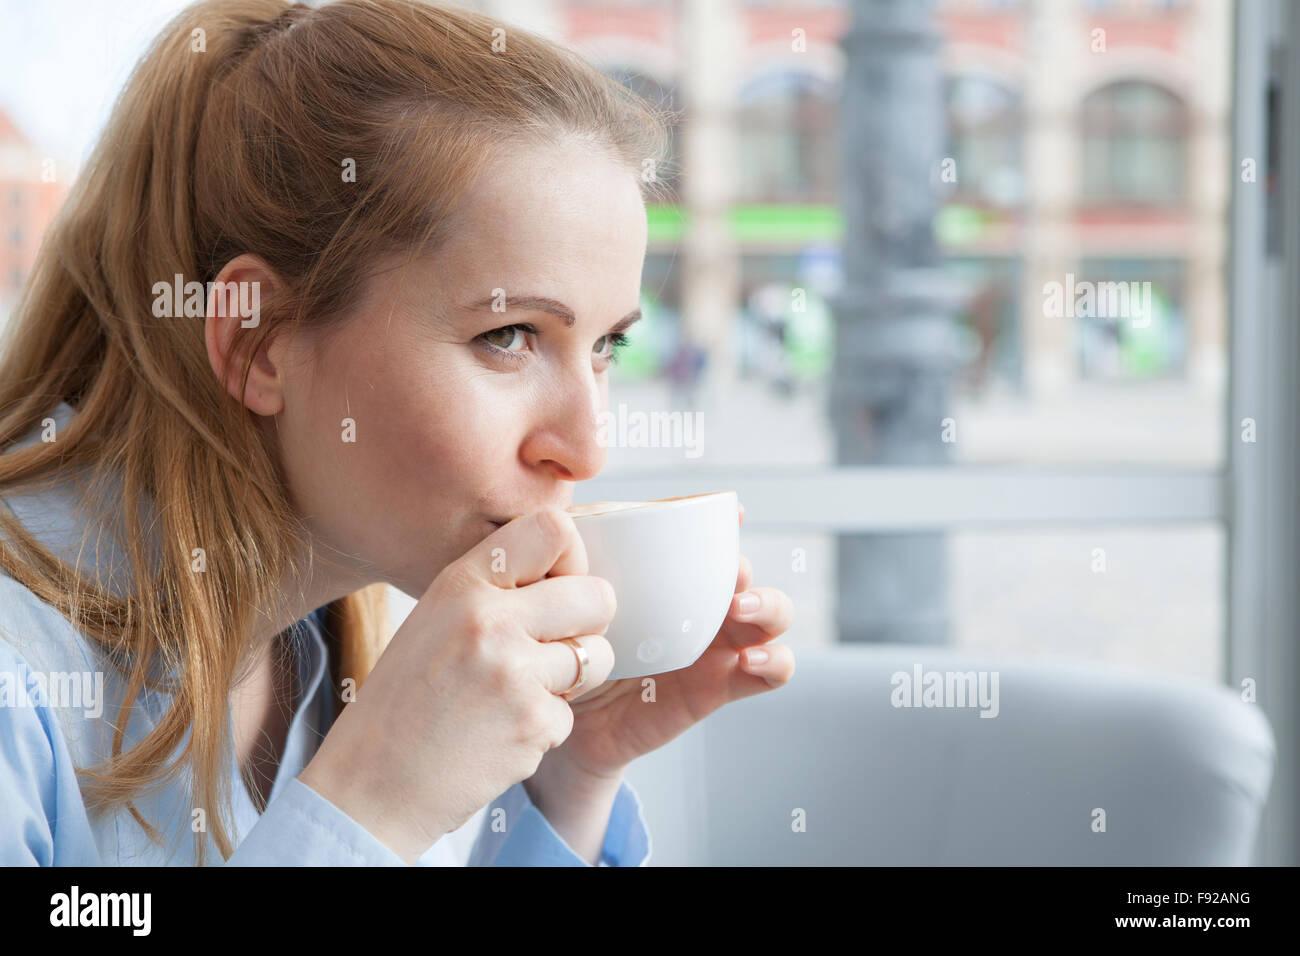 Woman drinking coffee Photo Stock